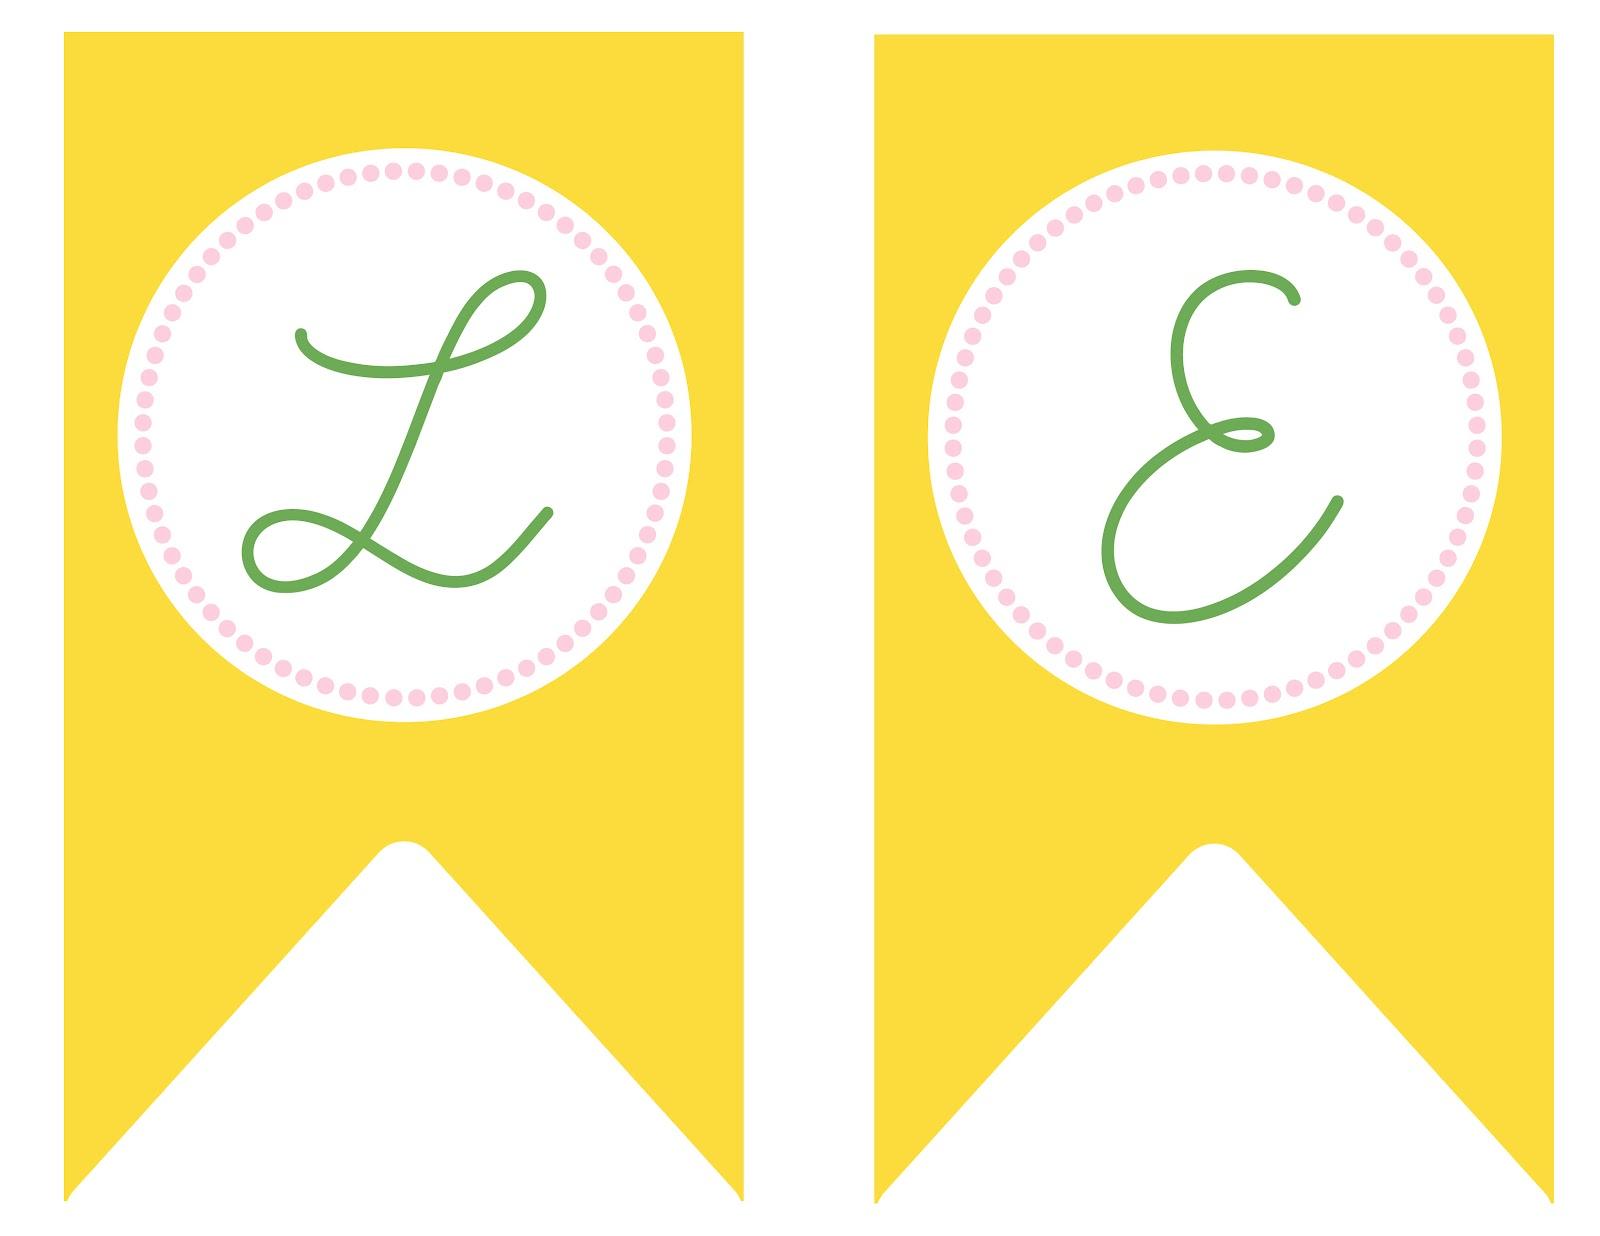 Sophie S Lemonade Stand Free Lemonade Banner Printable